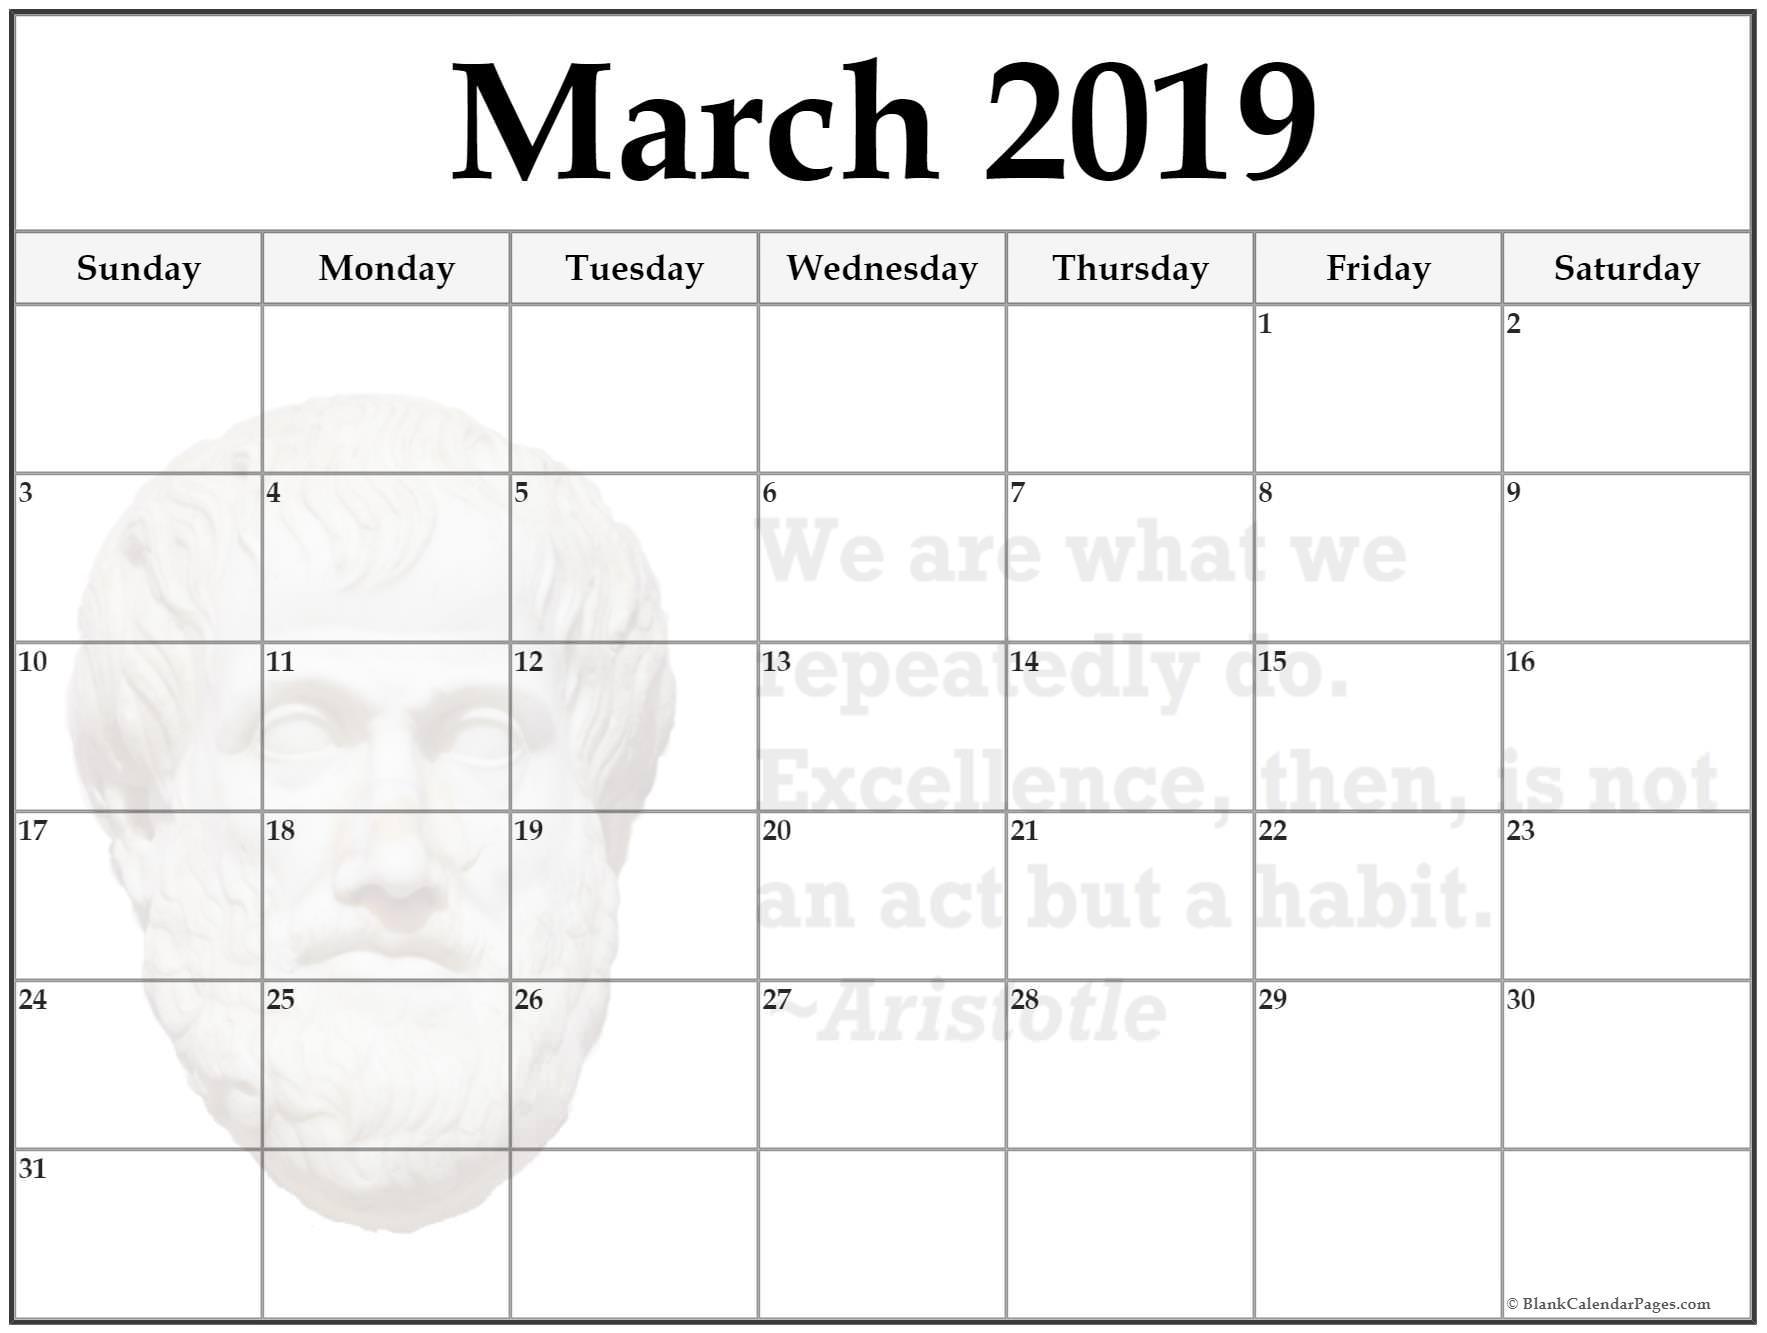 March Holiday Calendar 2019 Más Reciente Free Download March 2019 Blank Calendar Blank Calendar 2019 Of March Holiday Calendar 2019 Más Caliente Printable March 2019 Calendar Template Holidays Yes Calendars